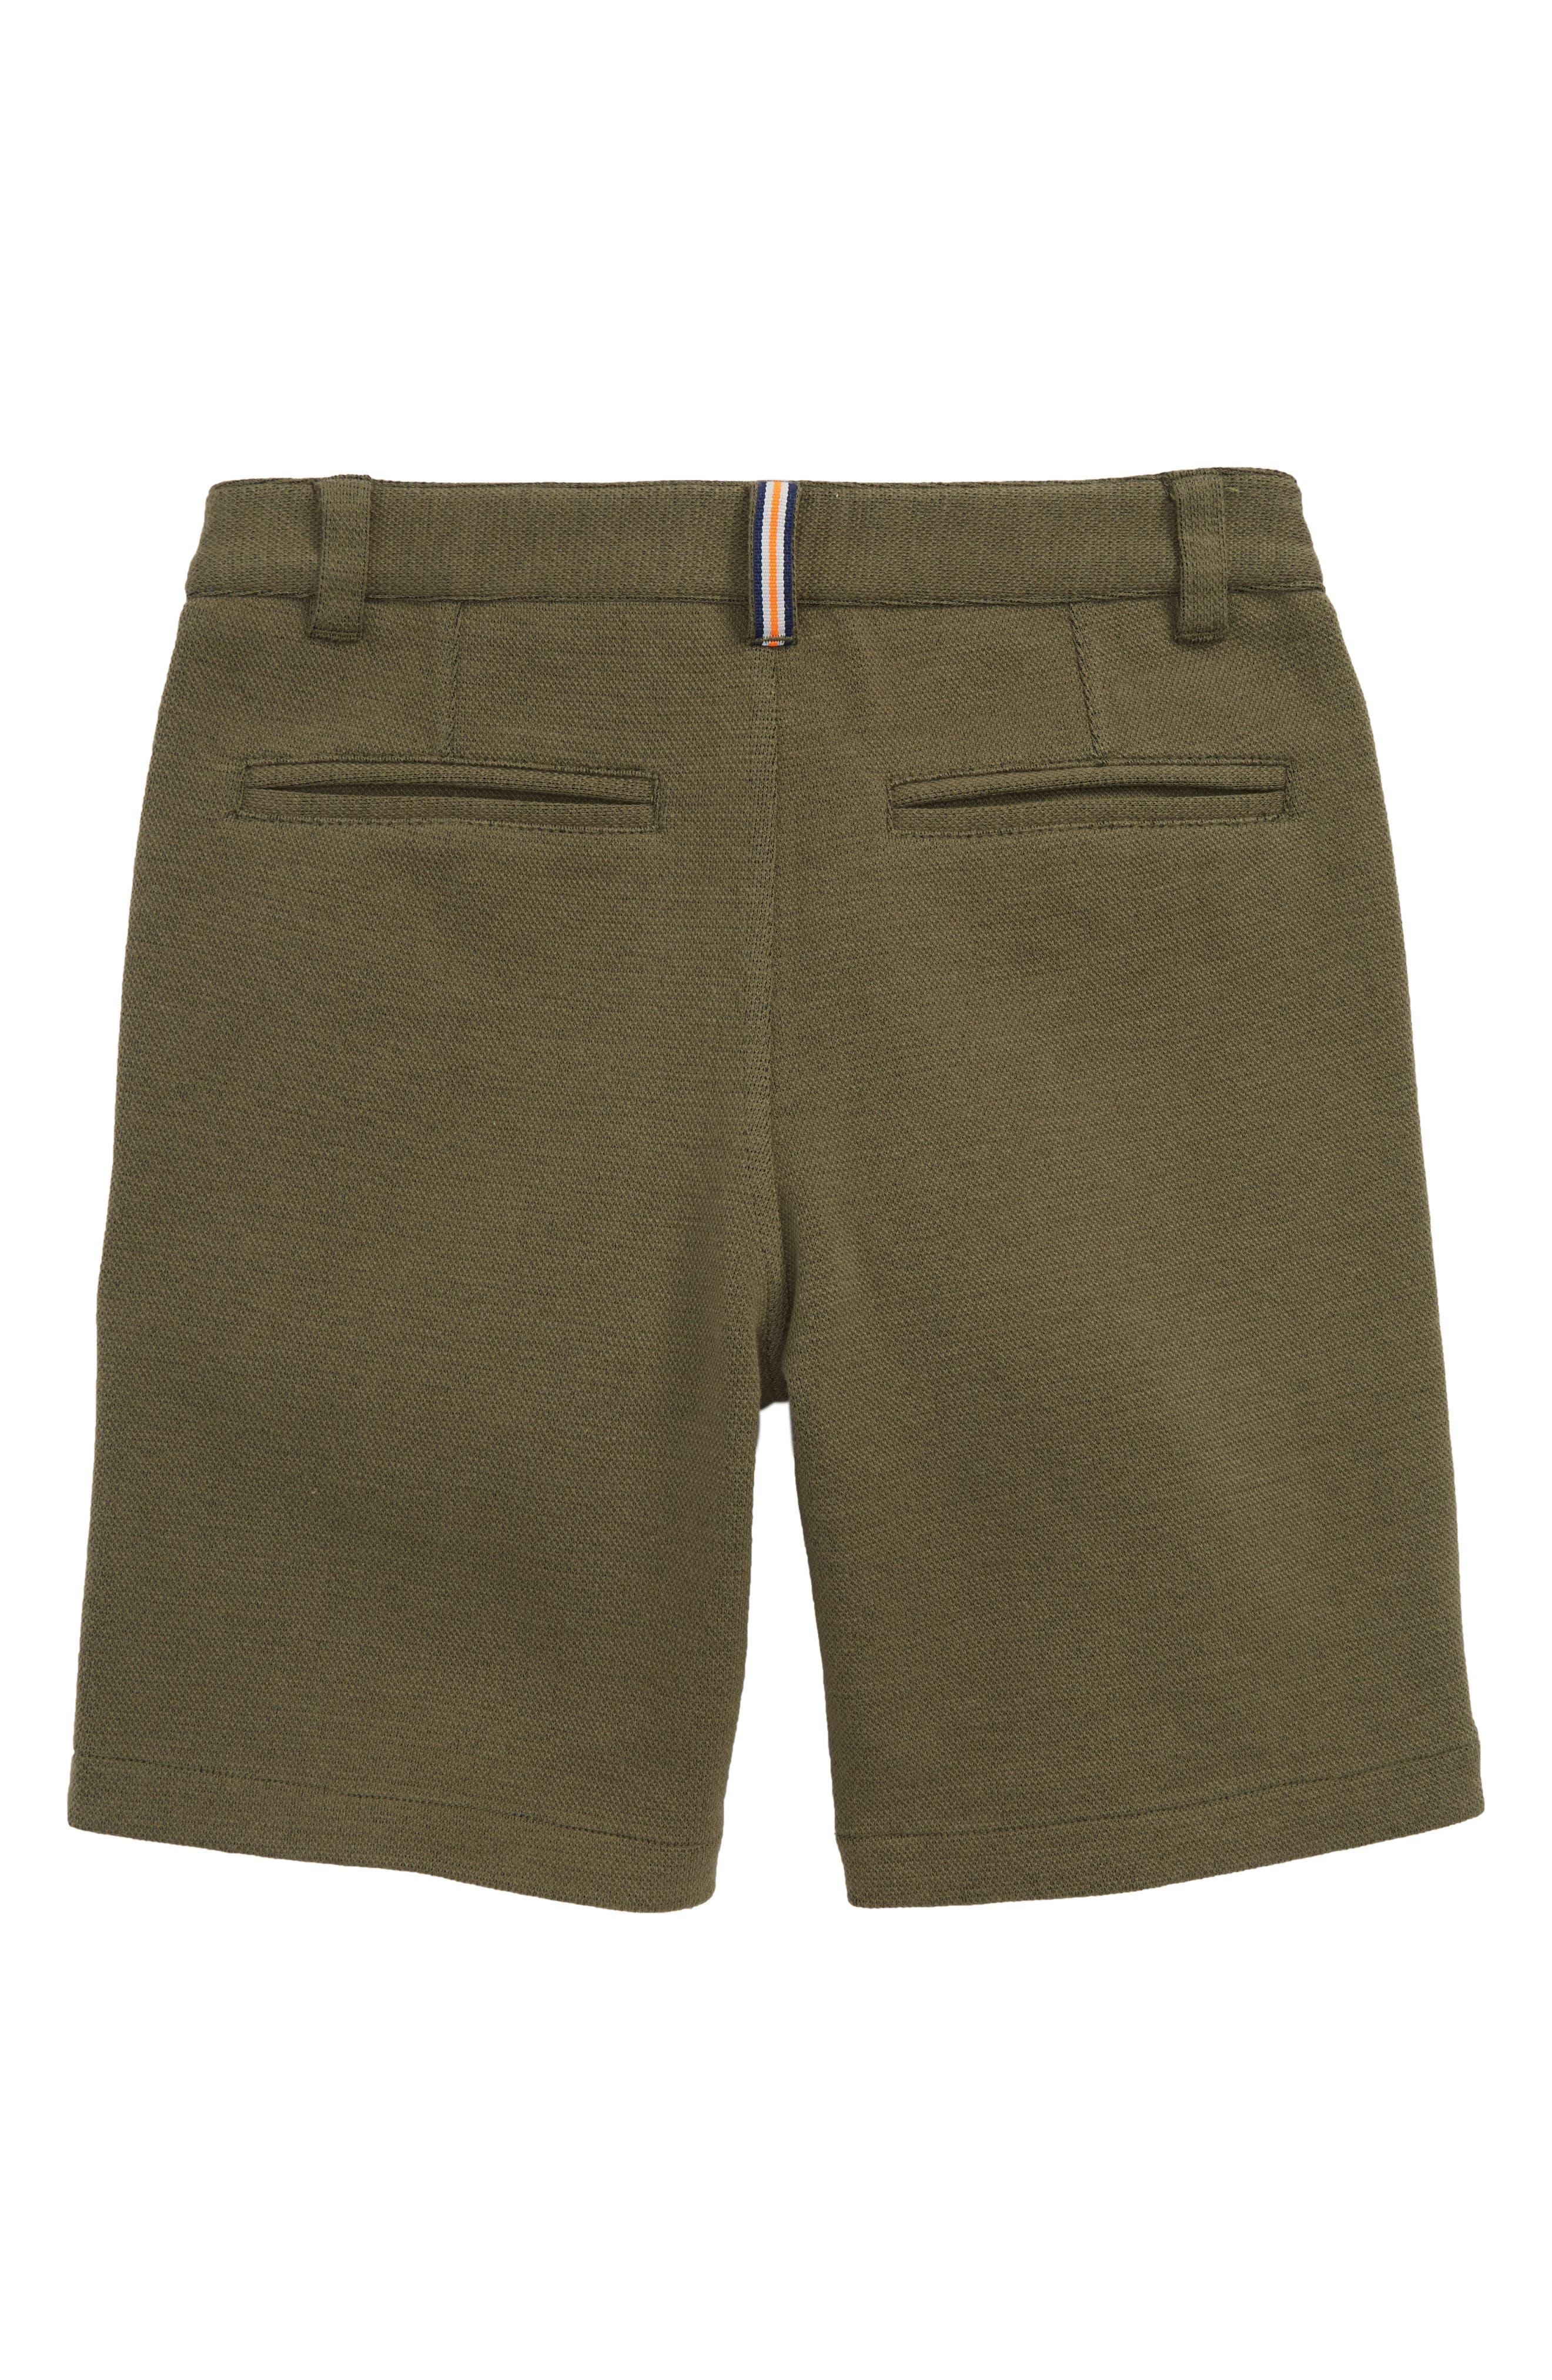 Jersey Chino Shorts,                             Alternate thumbnail 2, color,                             304